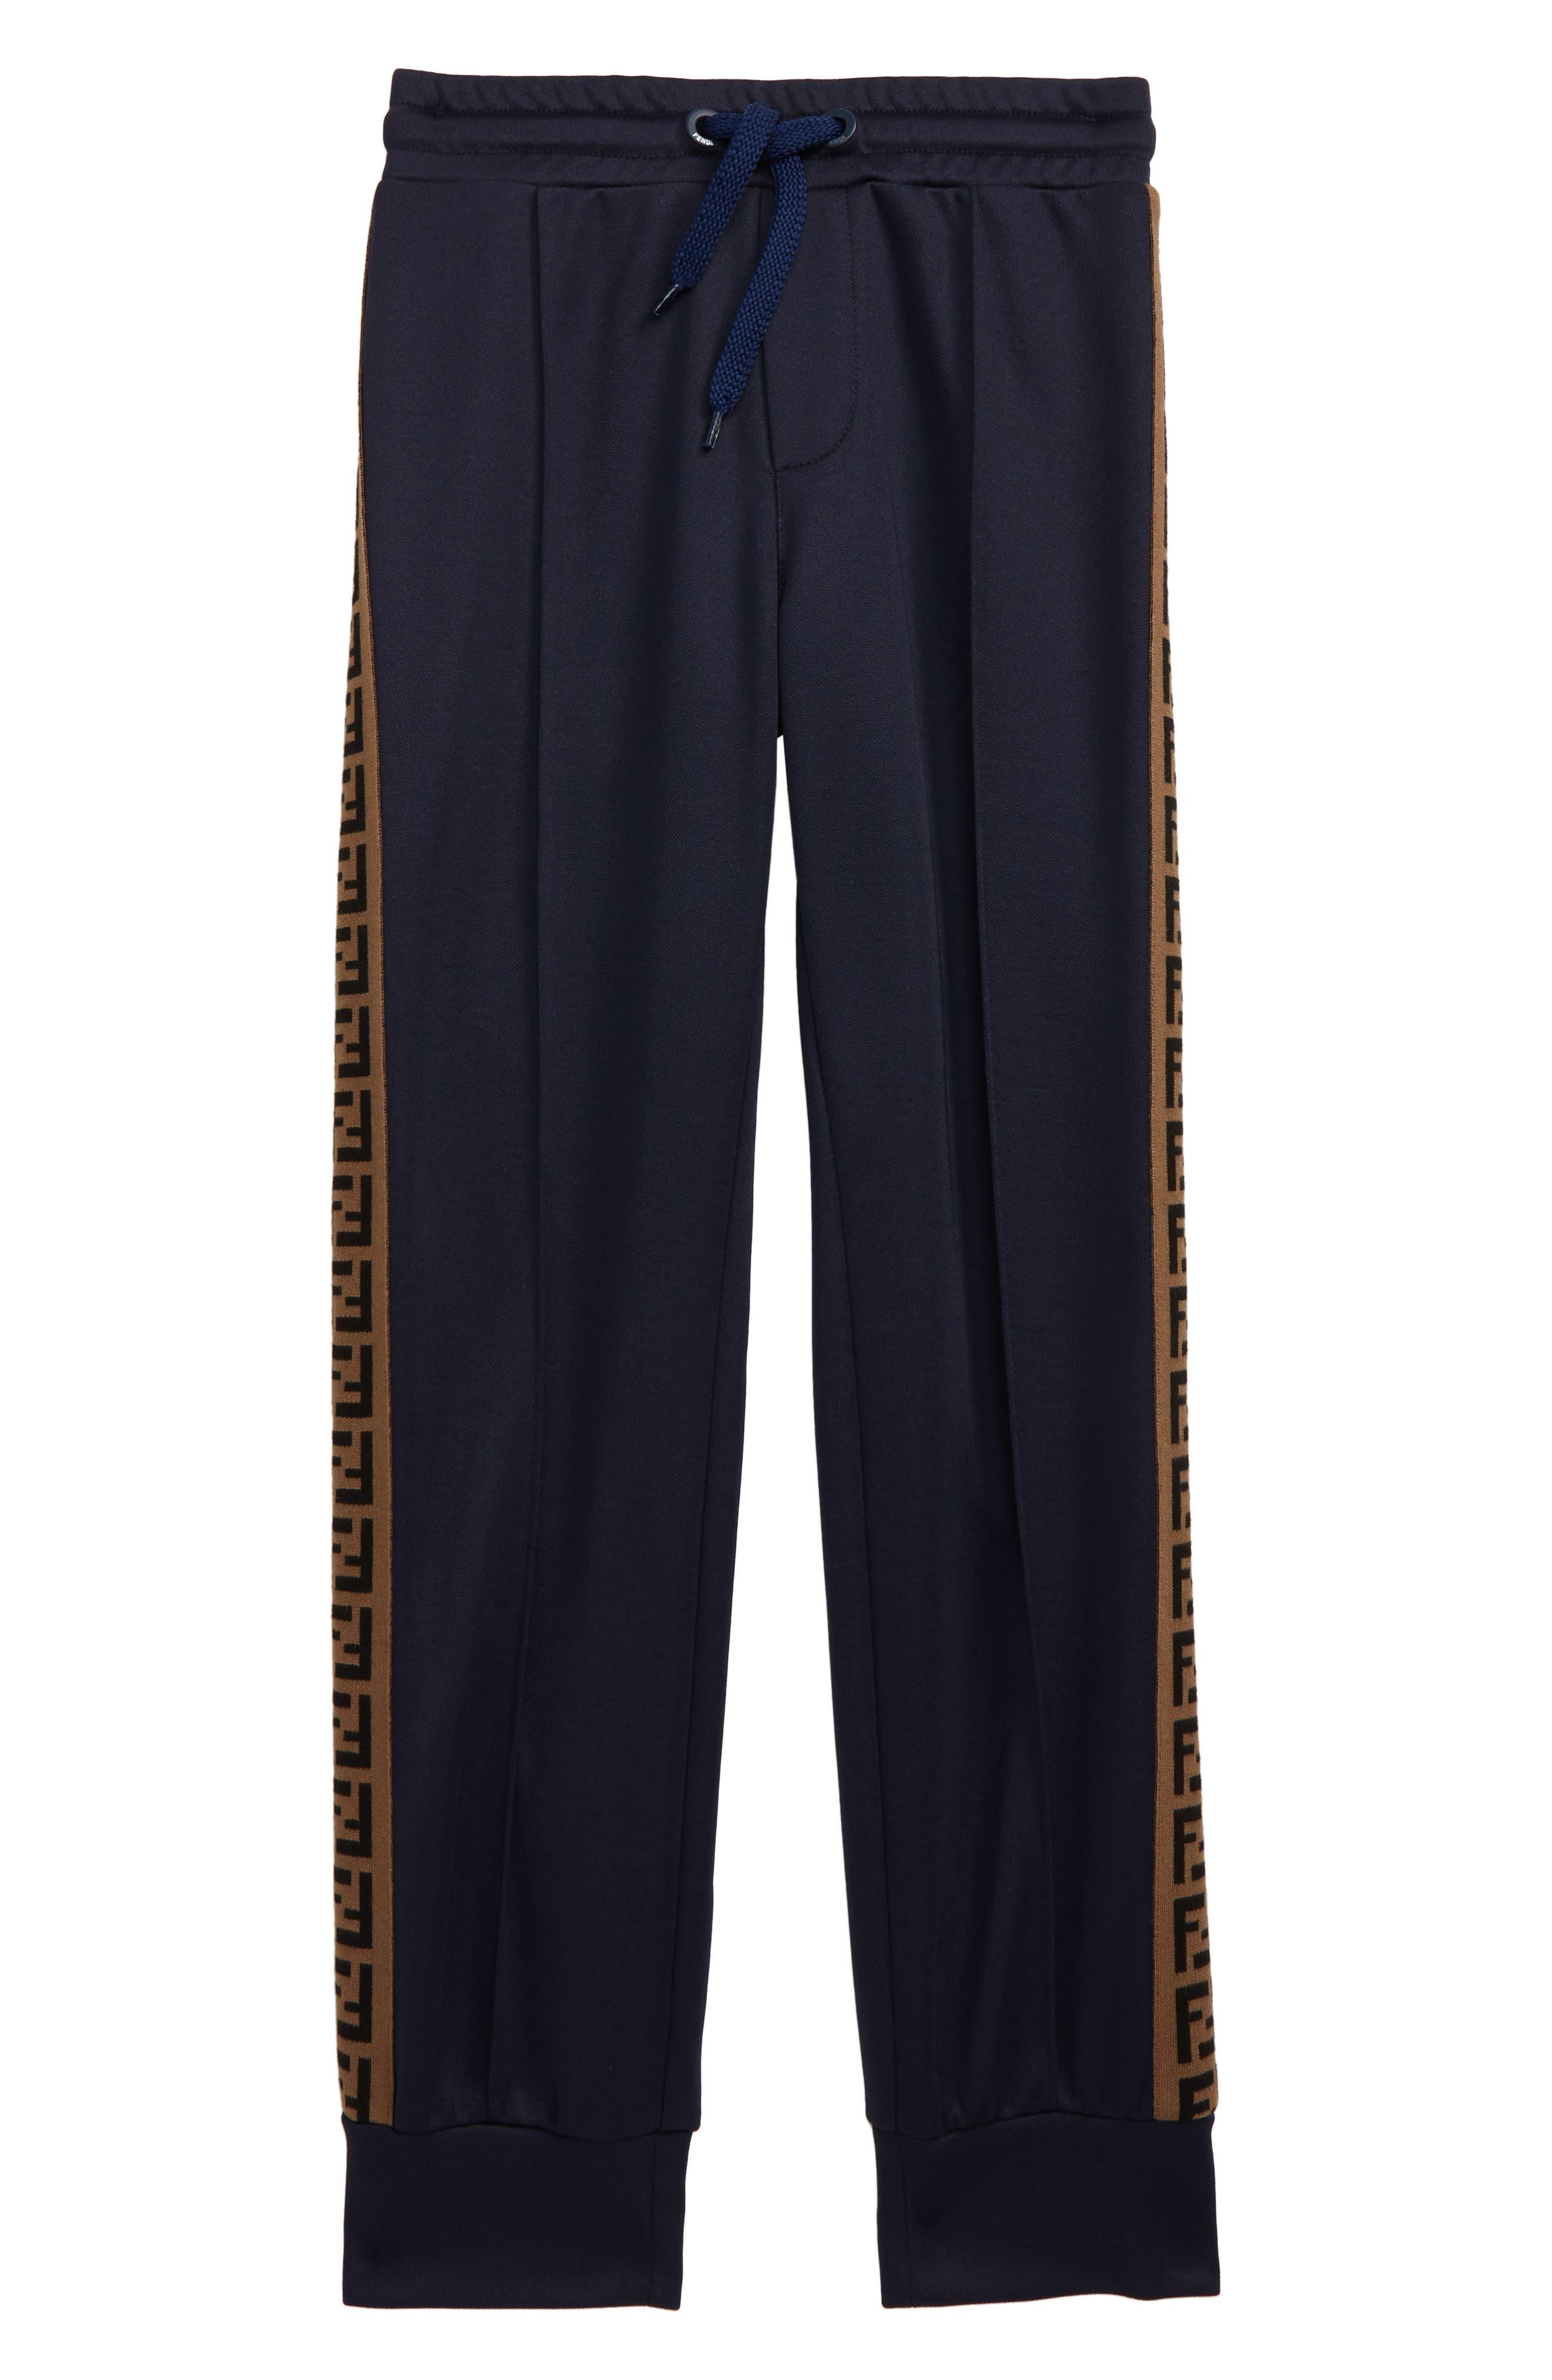 Boys Fendi Logo Stripe Track Pants Size 4Y  Blue